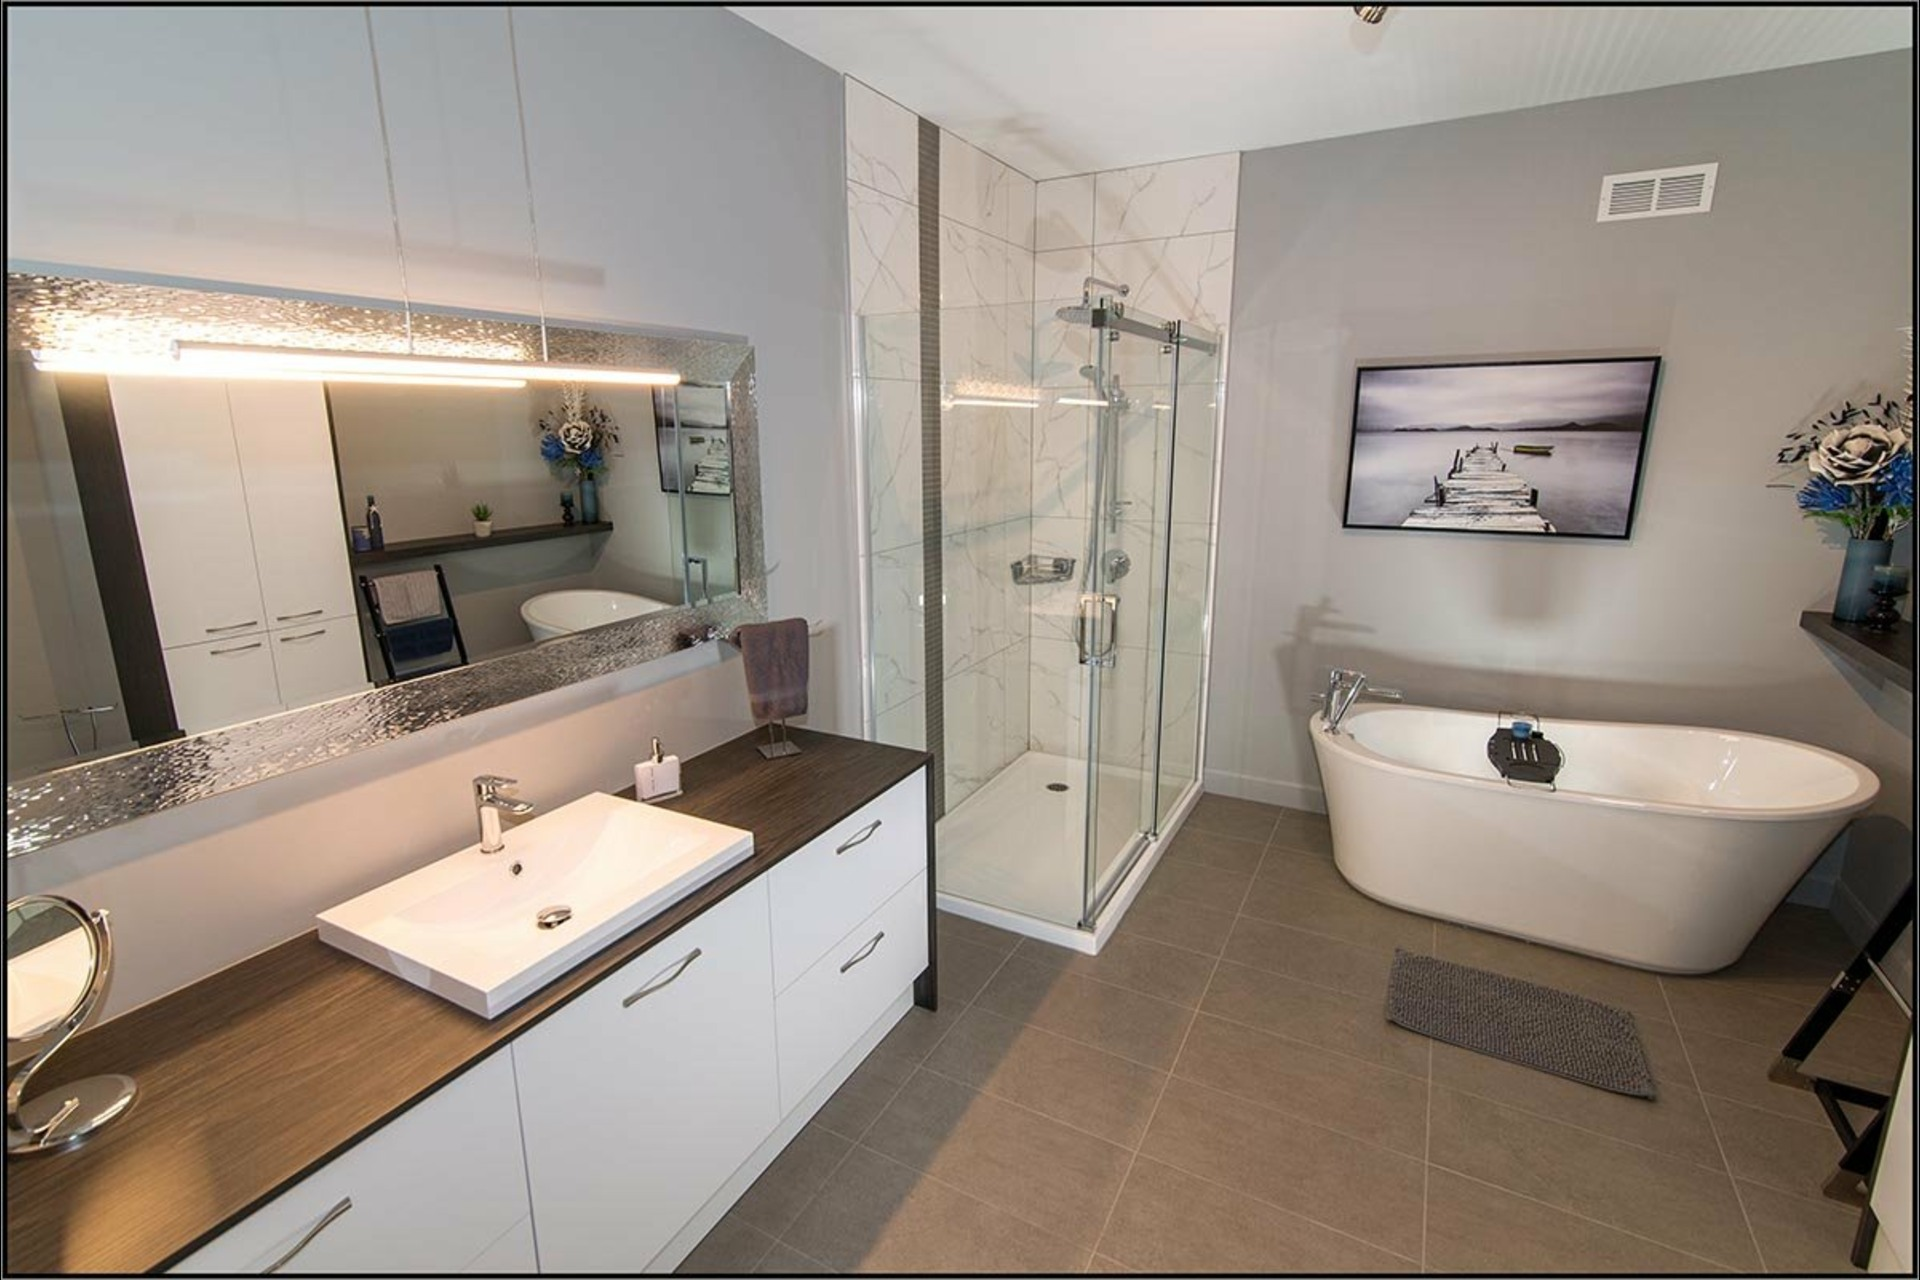 image 8 - Apartment For sale Sainte-Marie - 9 rooms